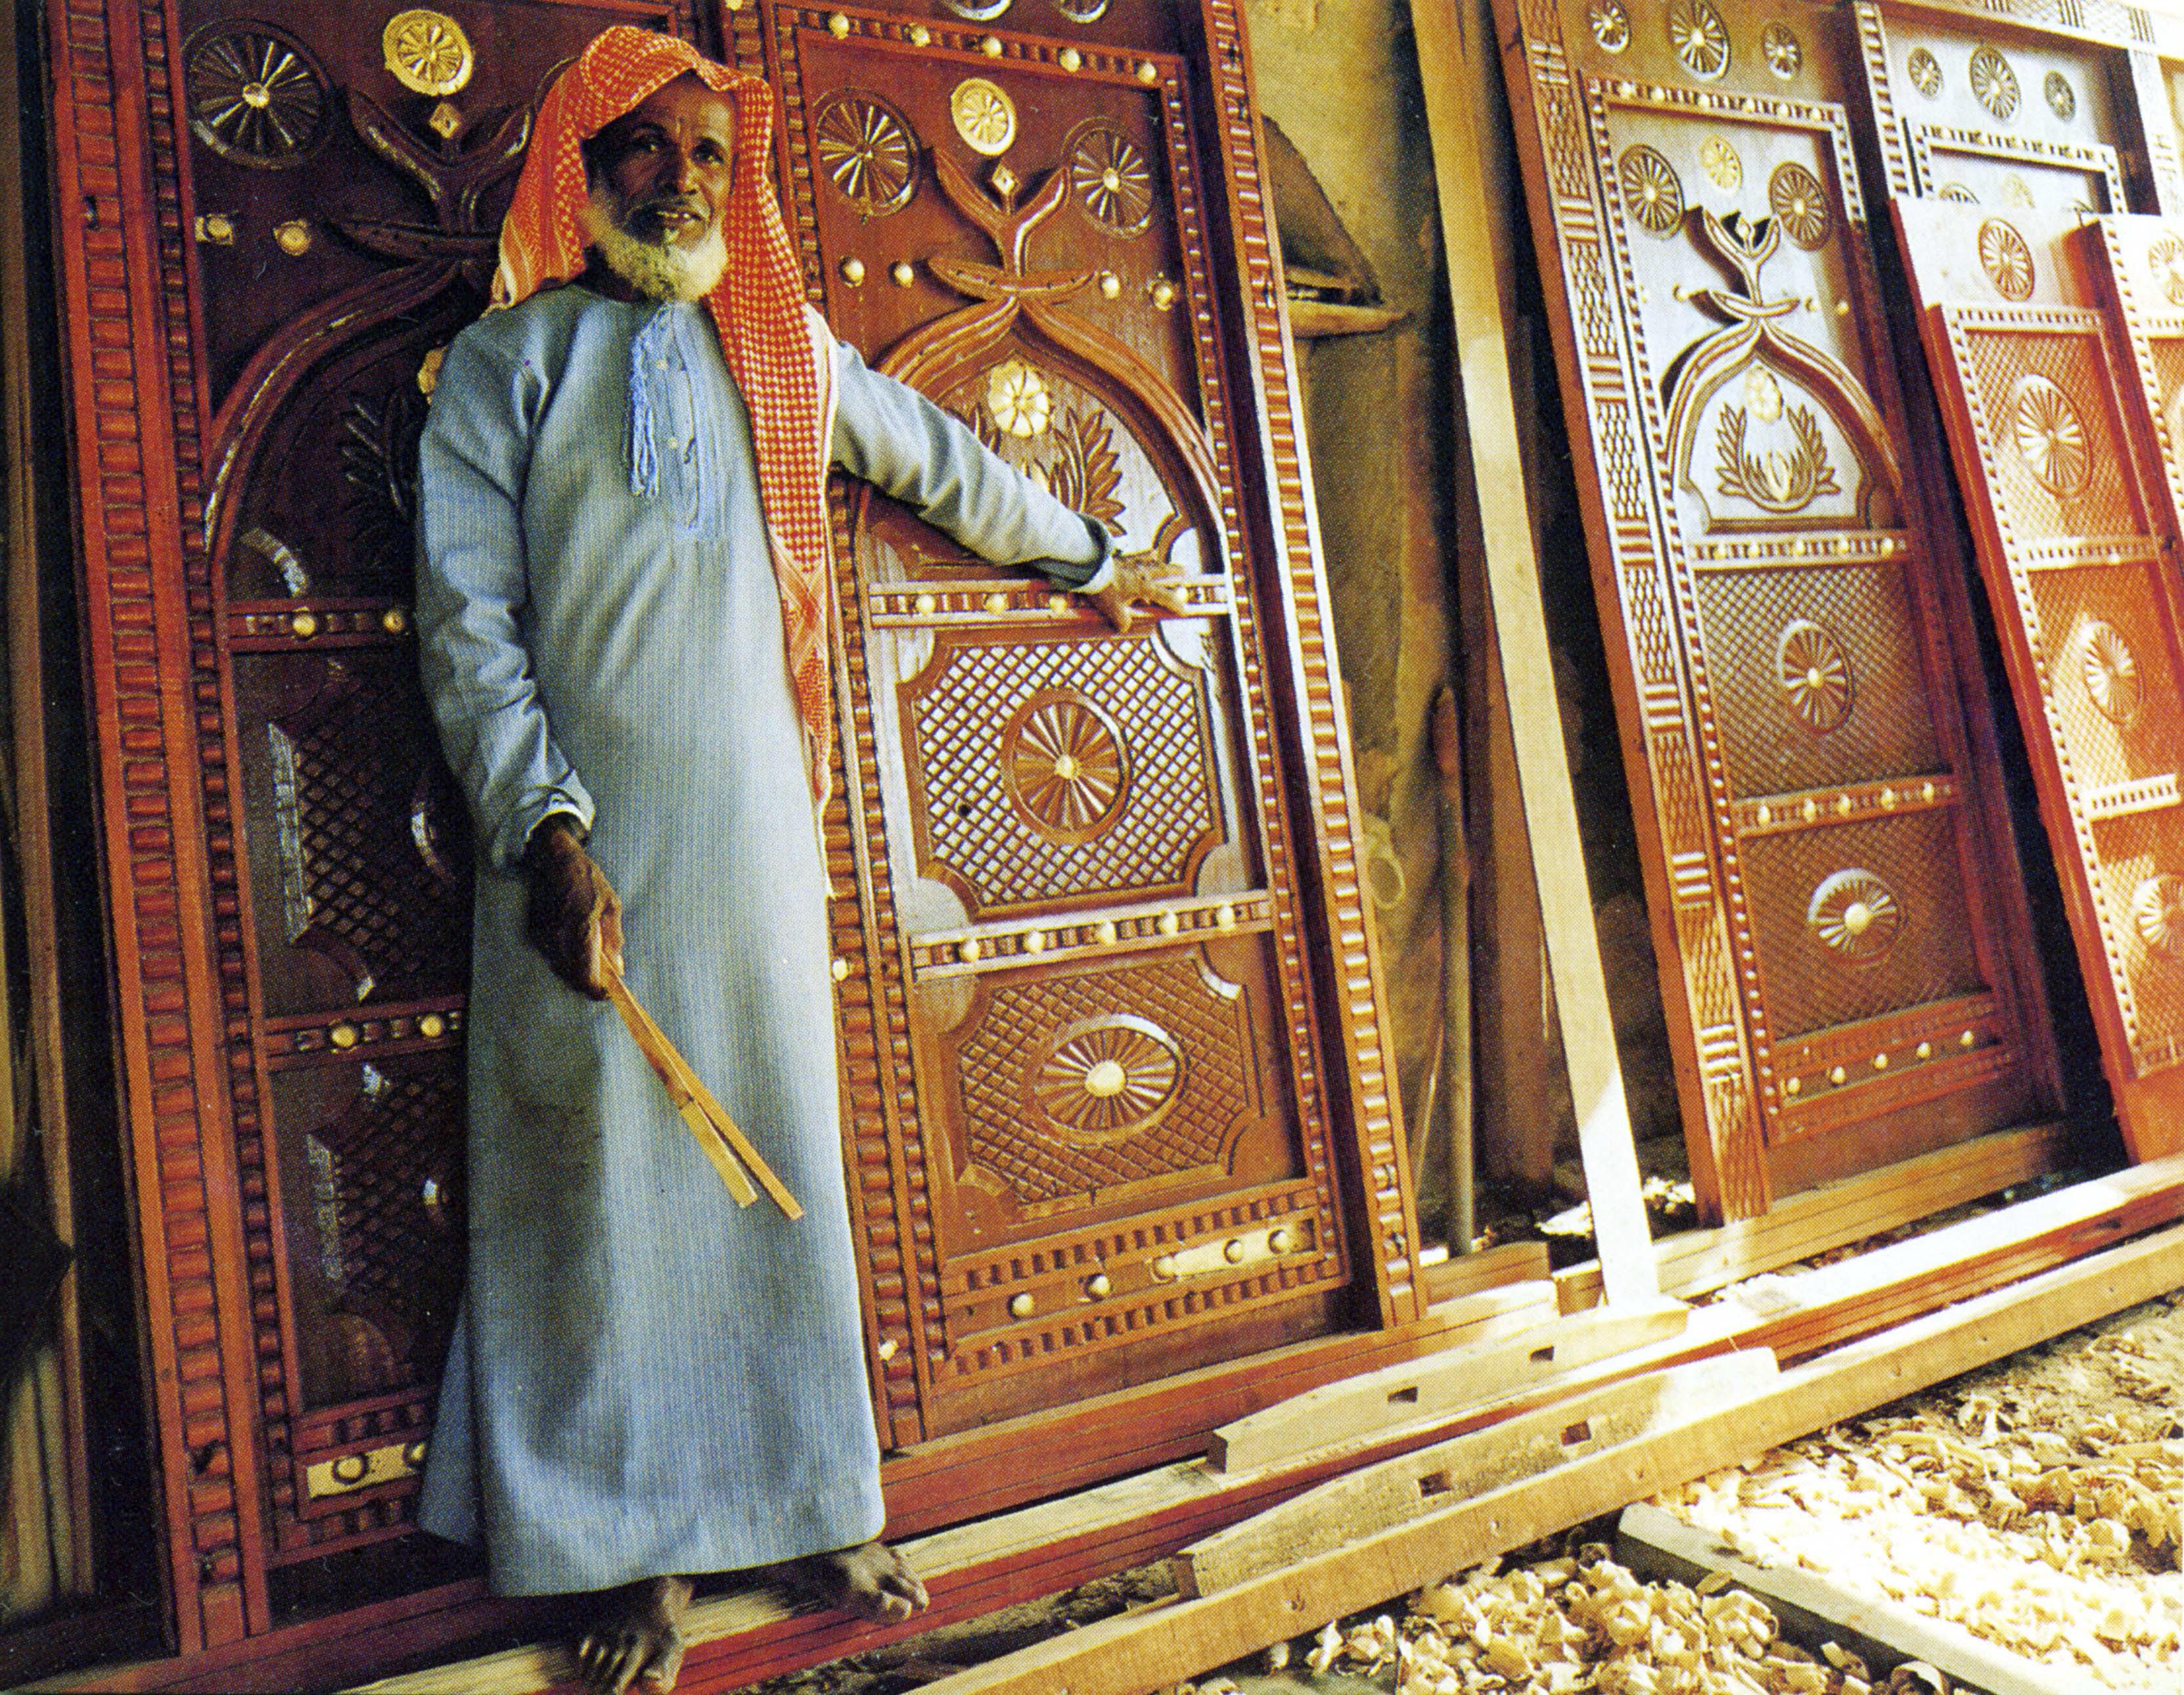 taSauwur Sultanate of Oman